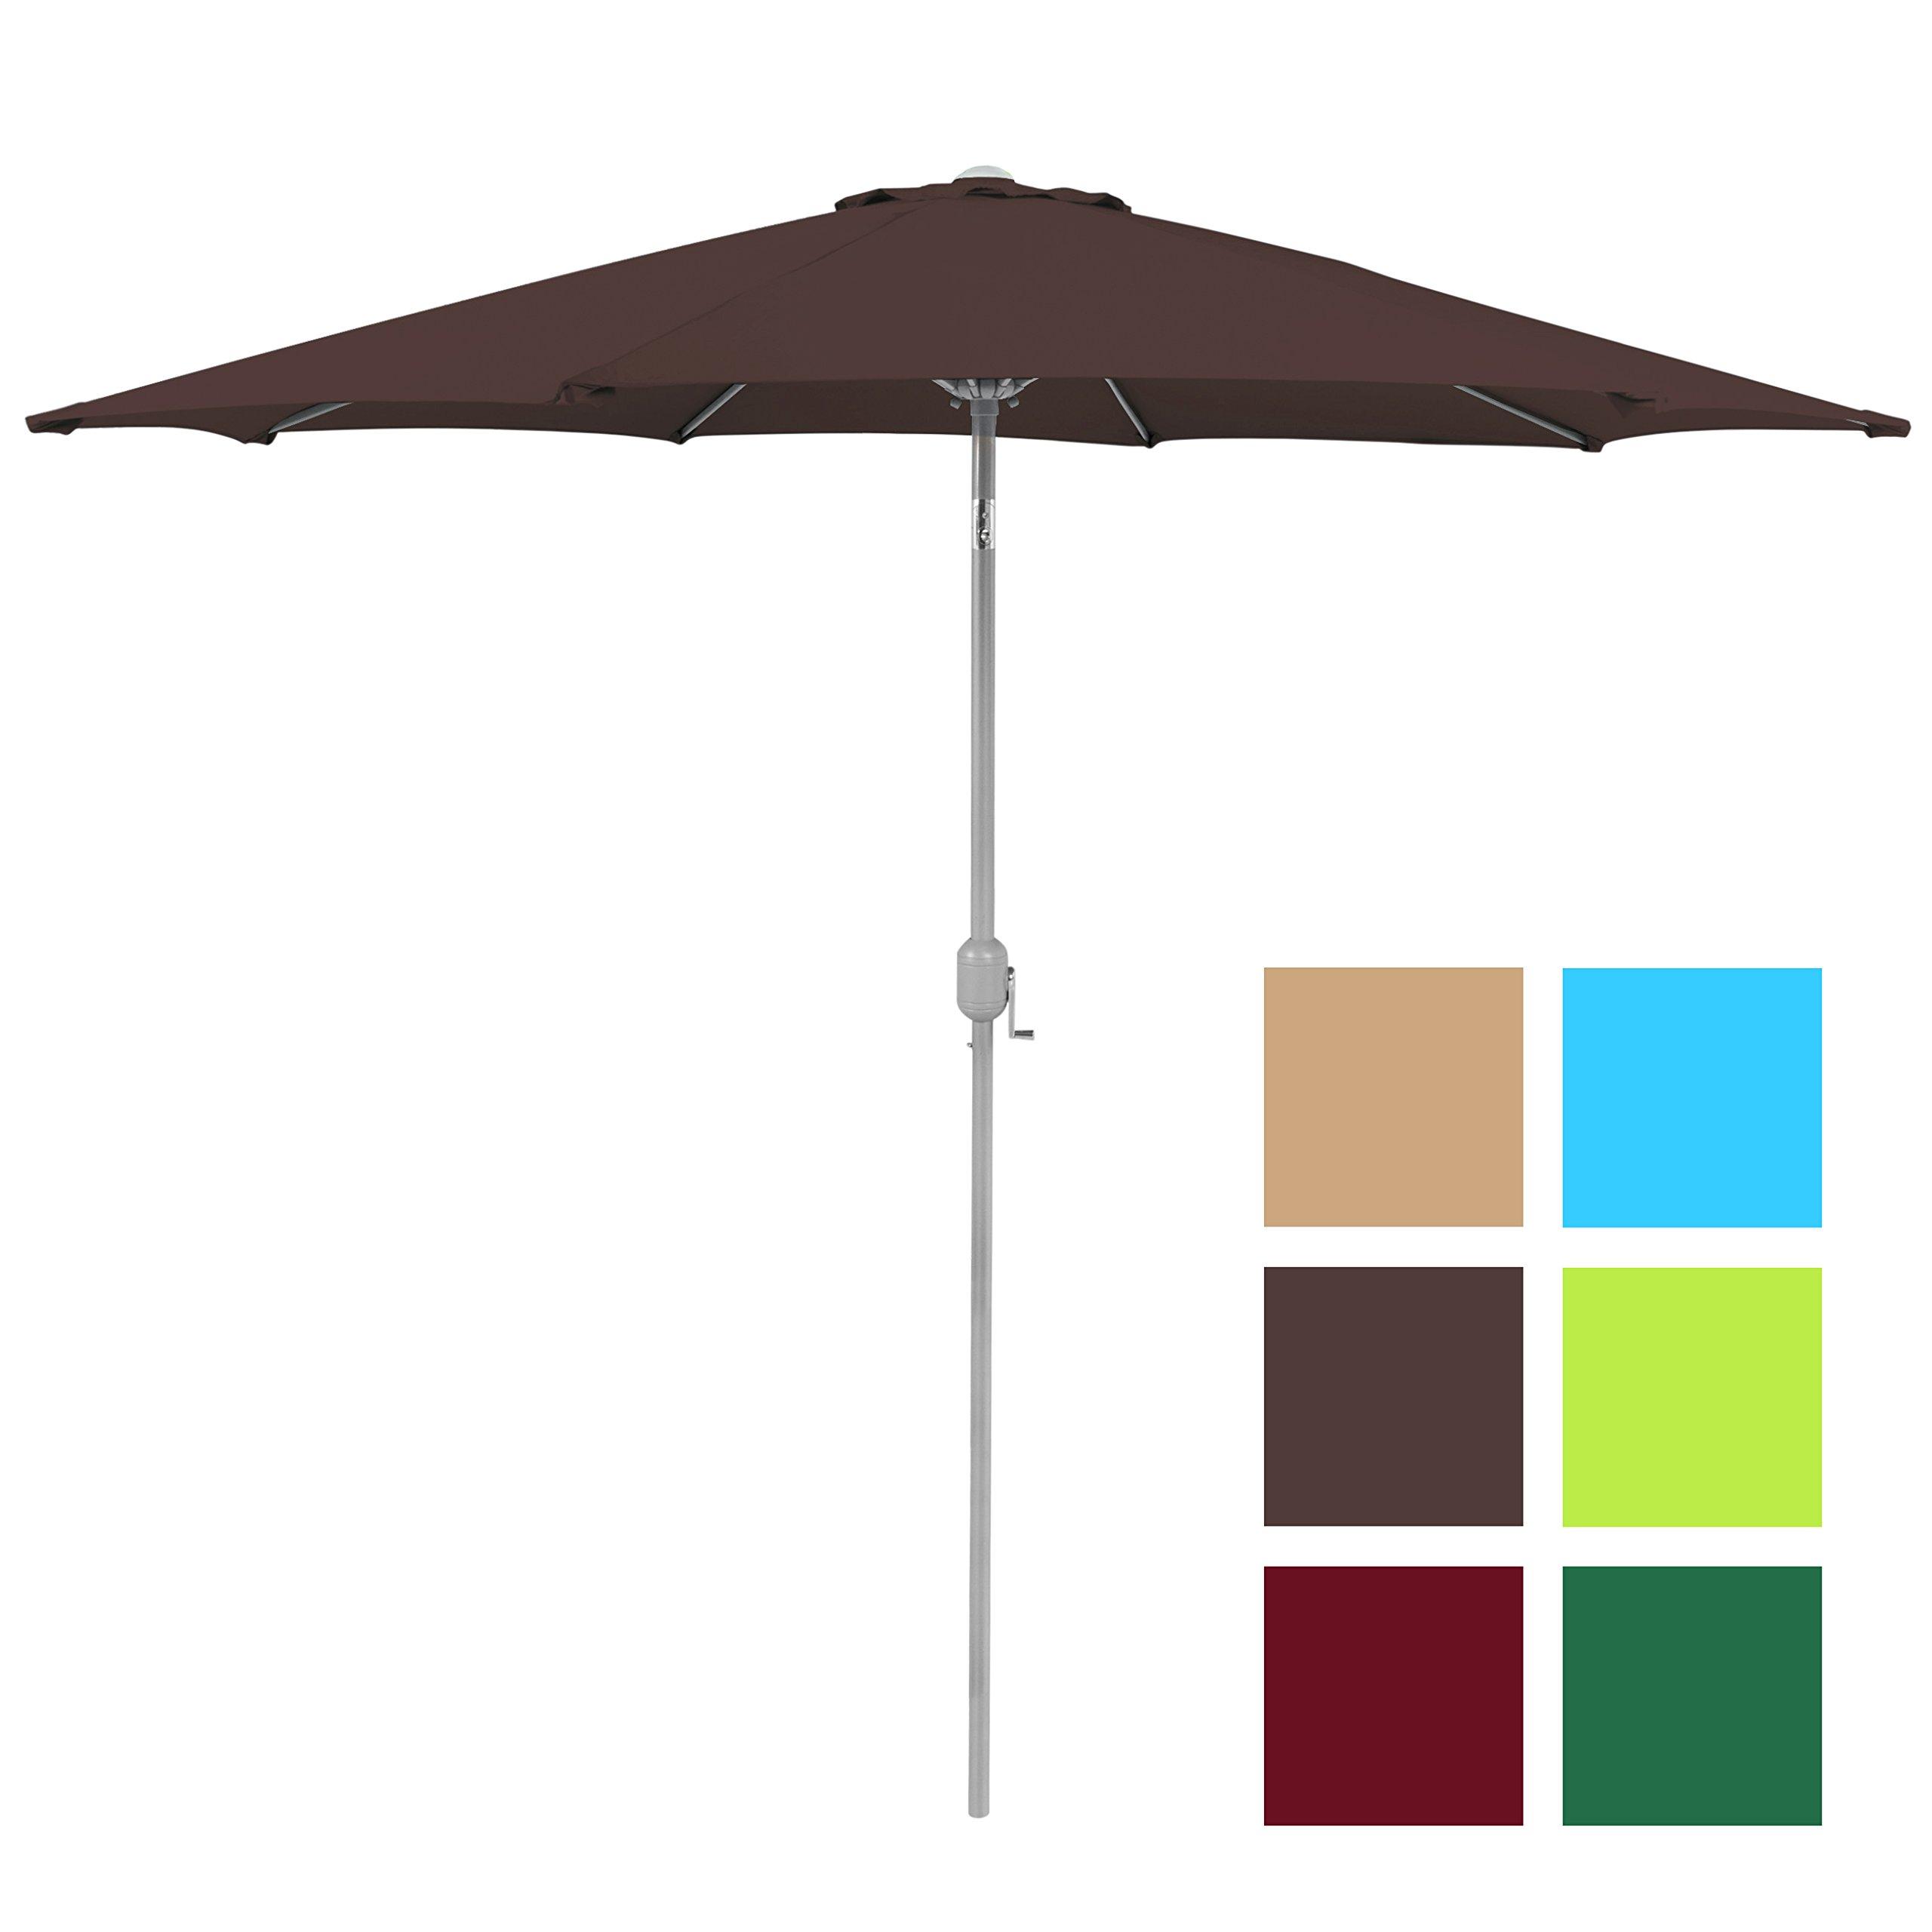 Best Choice Products Patio Umbrella 9ft Aluminum Outdoor Patio Market Umbrella w/Crank Tilt Adjustment - Brown